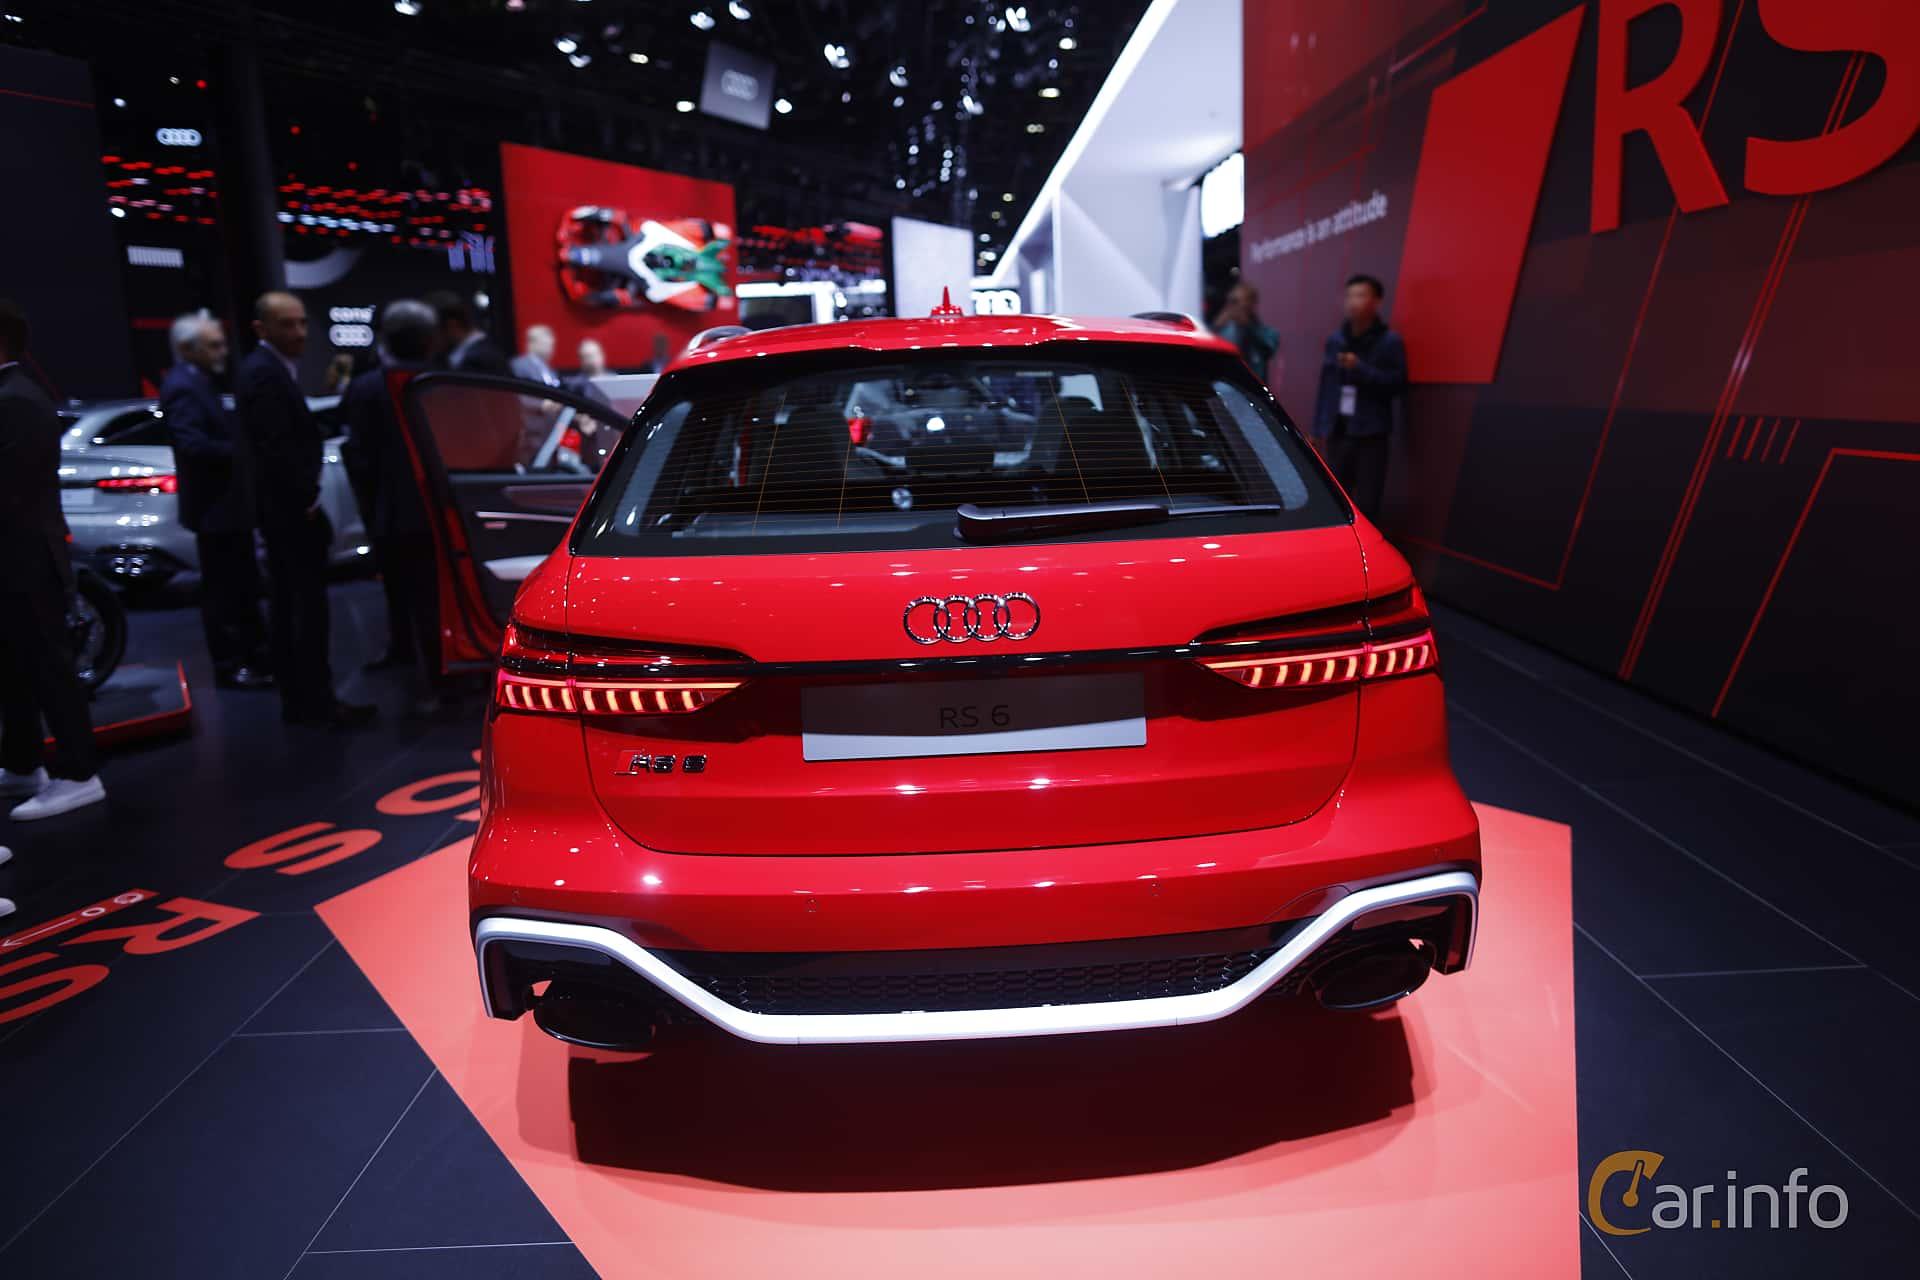 Audi RS 6 Avant  TipTronic, 600hp, 2020 at IAA 2019